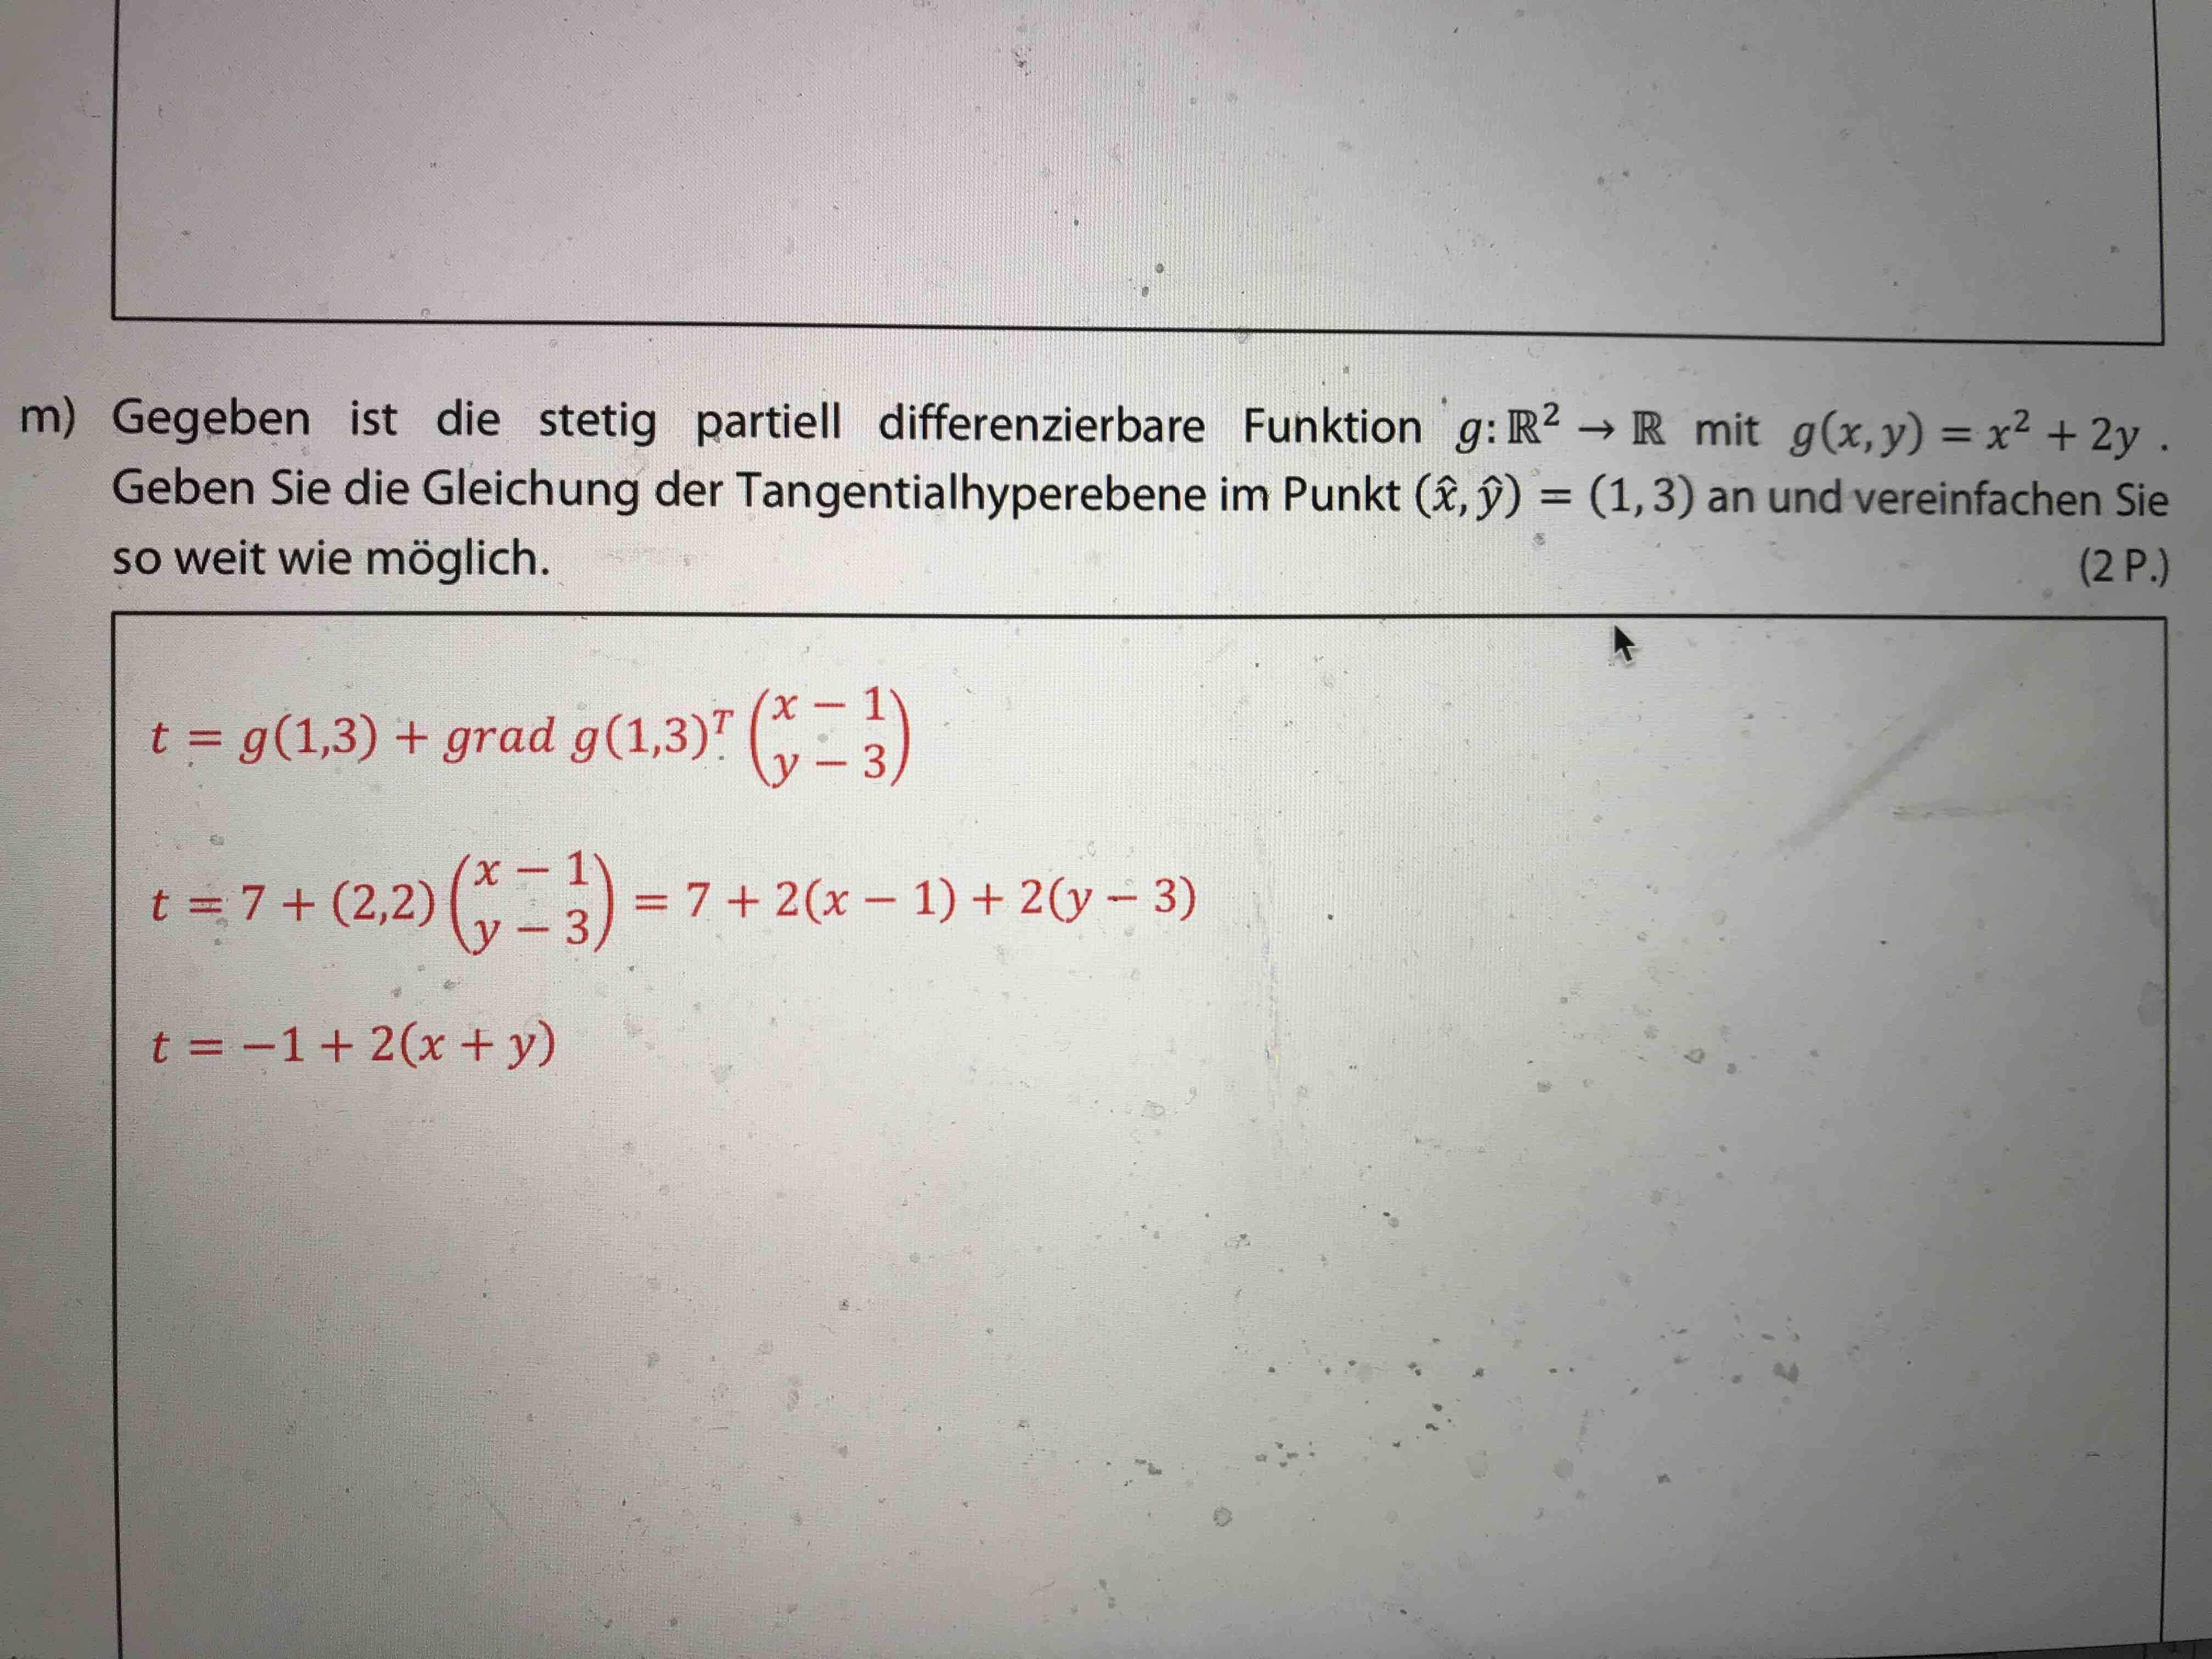 Amazing 2 Schritt Gleichungen Arbeitsblatt Pdf Image - Mathe ...